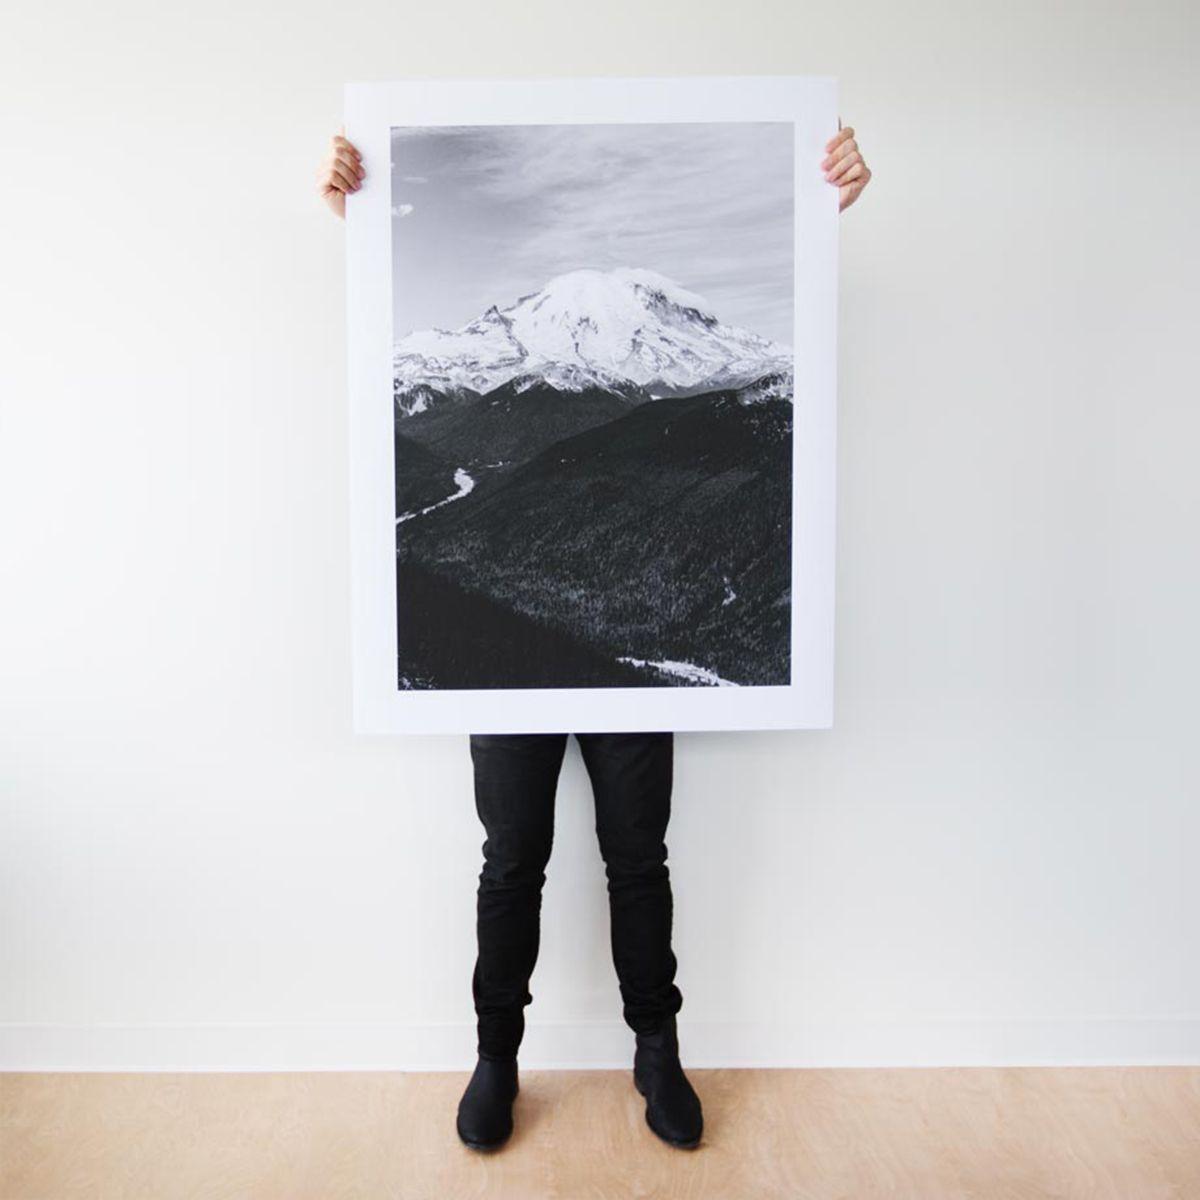 large-format-print-main05-holding-large-print_2x.jpg